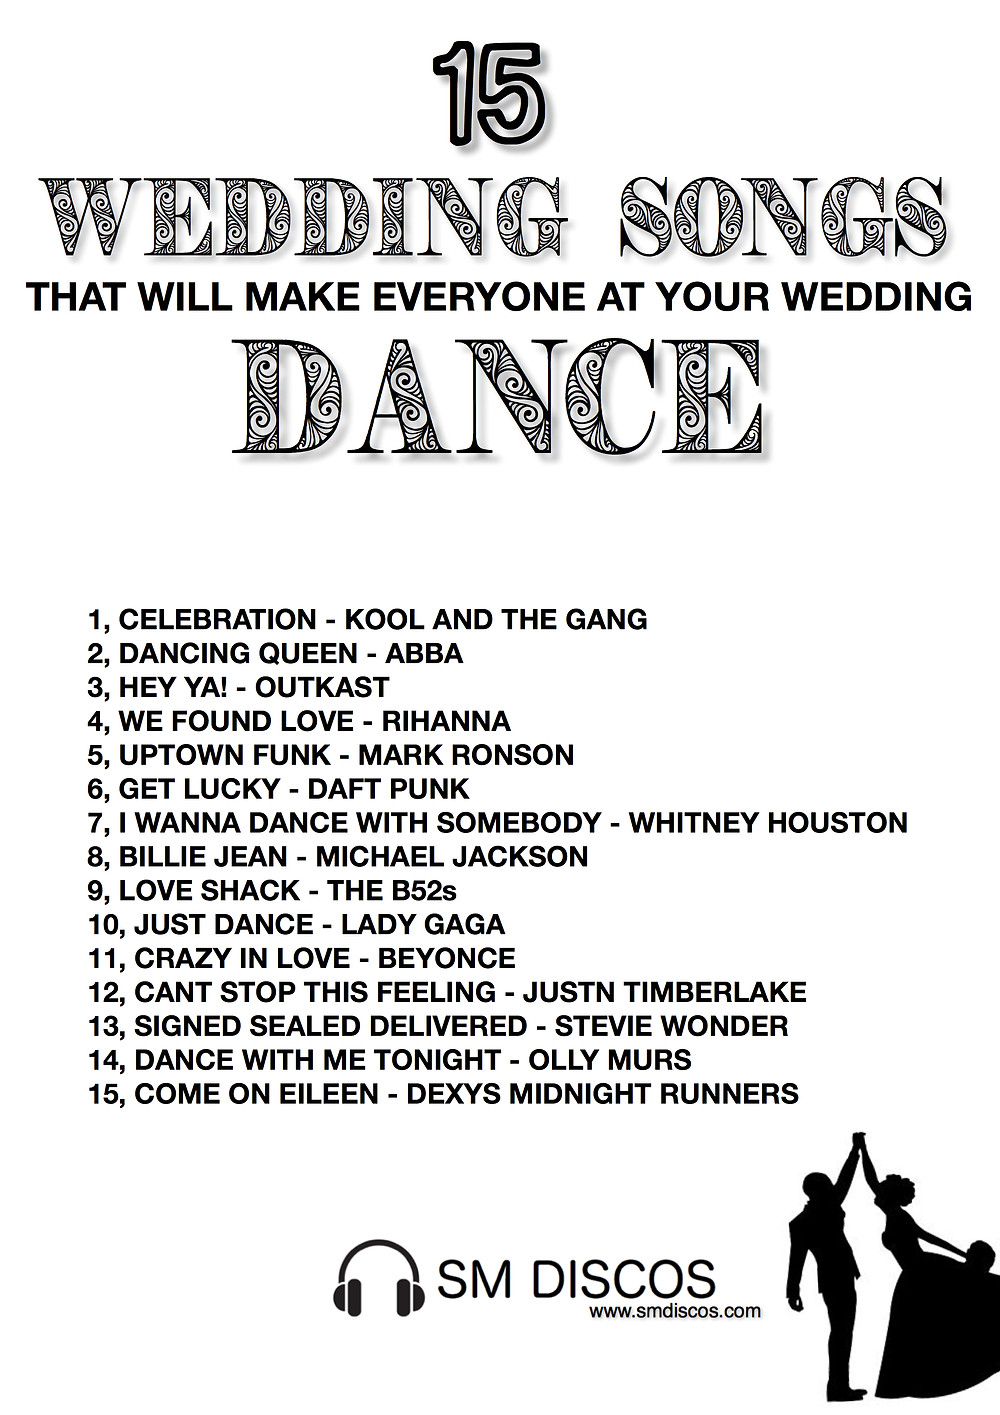 15 of the best wedding songs